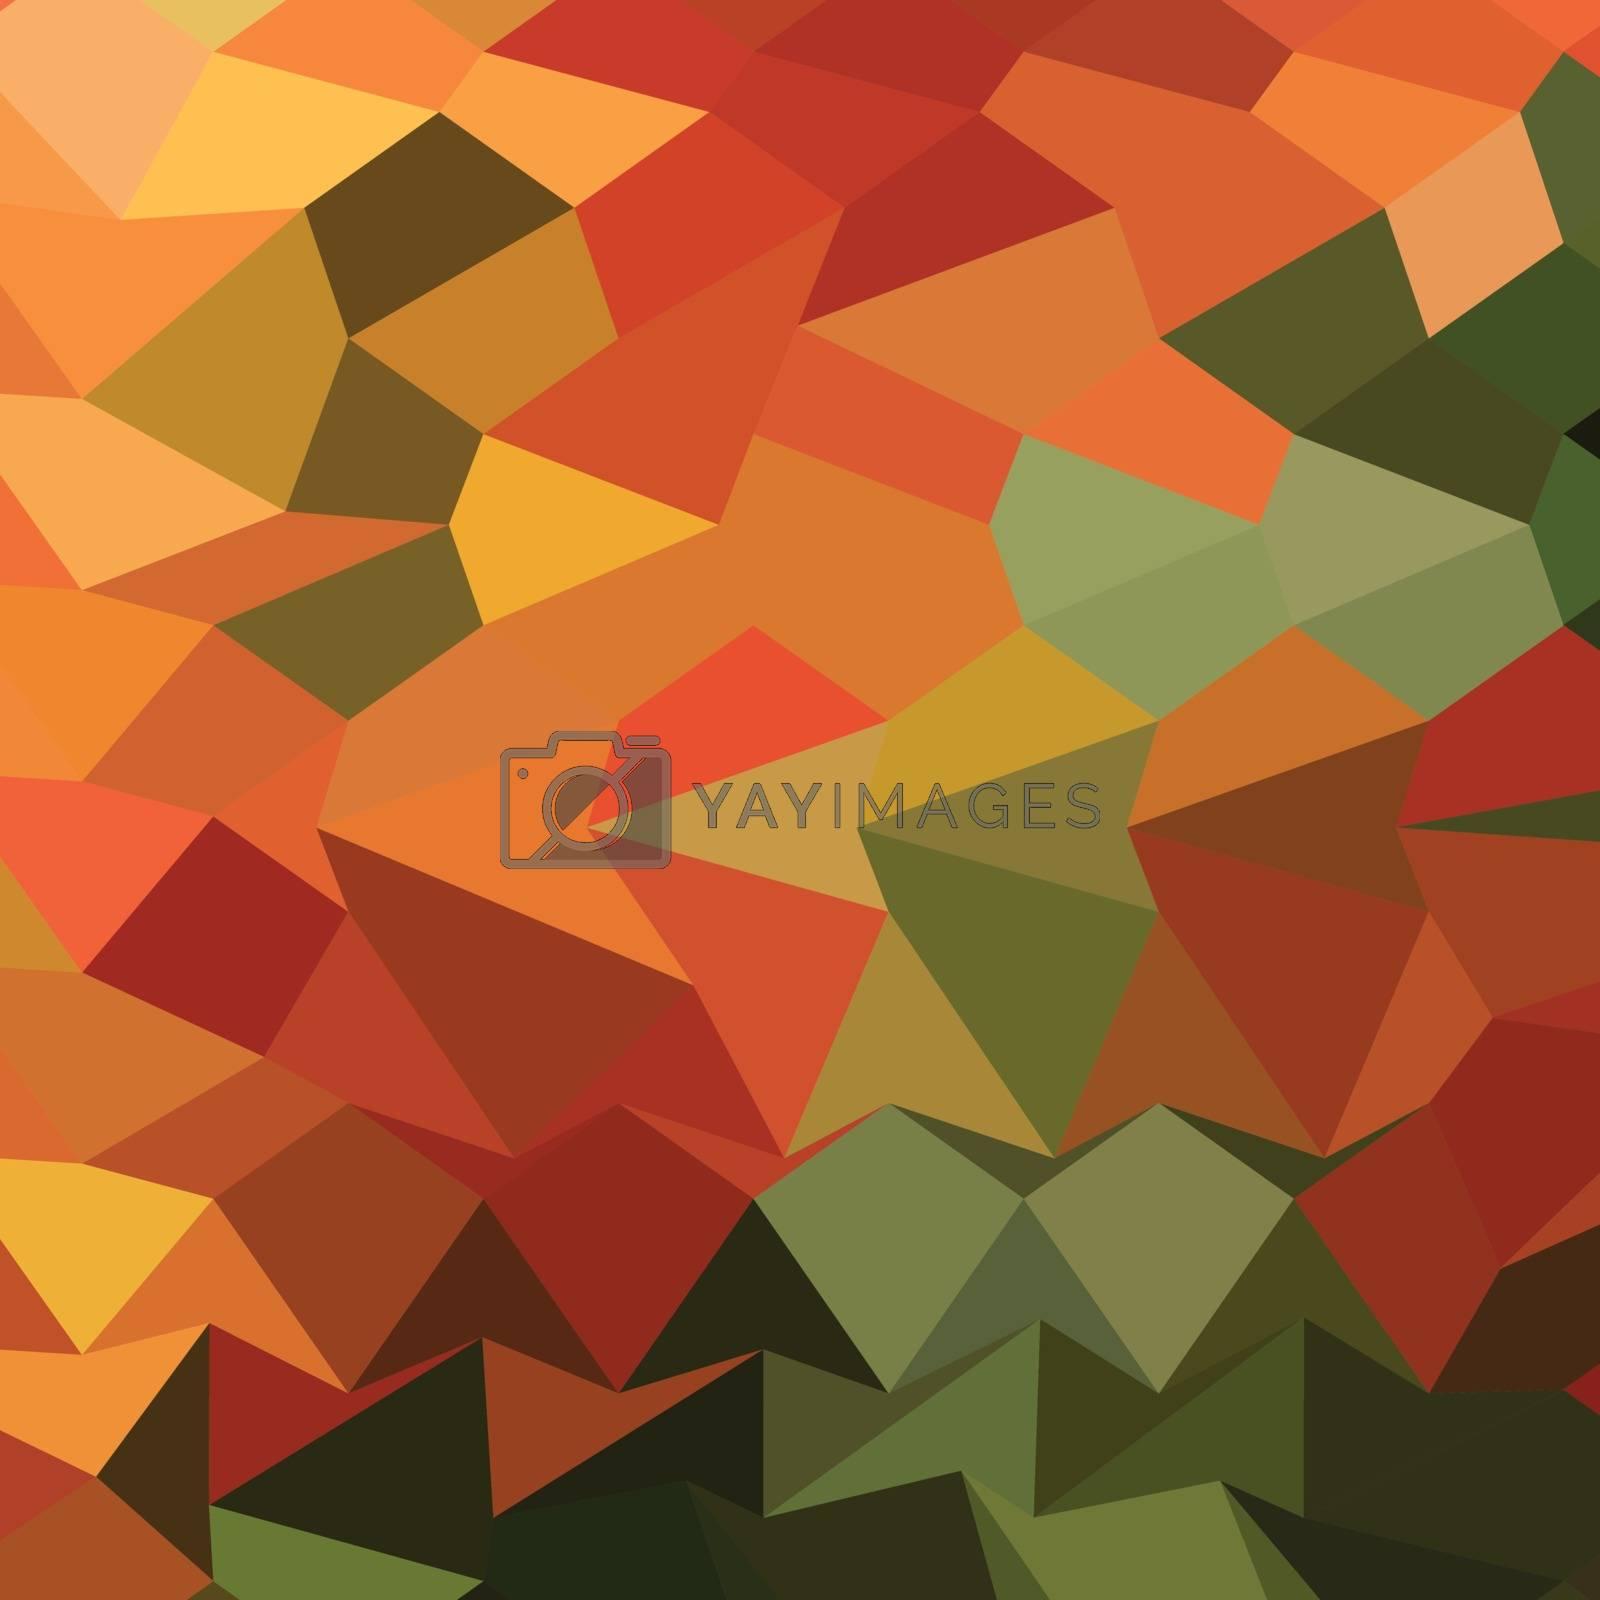 Low polygon style illustration of deep saffron orange abstract geometric background.